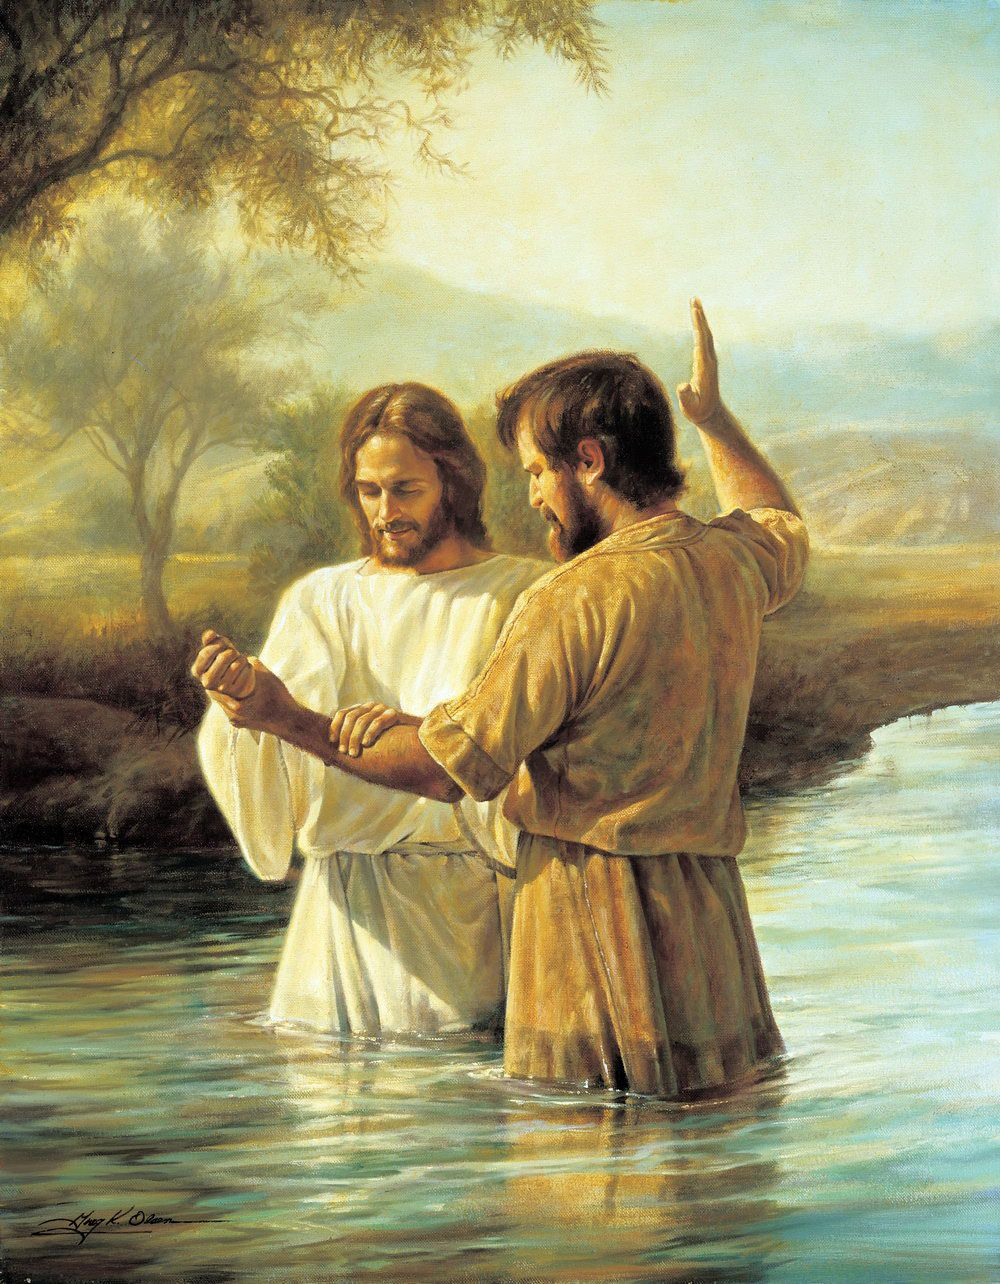 jesus christ lds - Google Search | Asian art | Pinterest ...